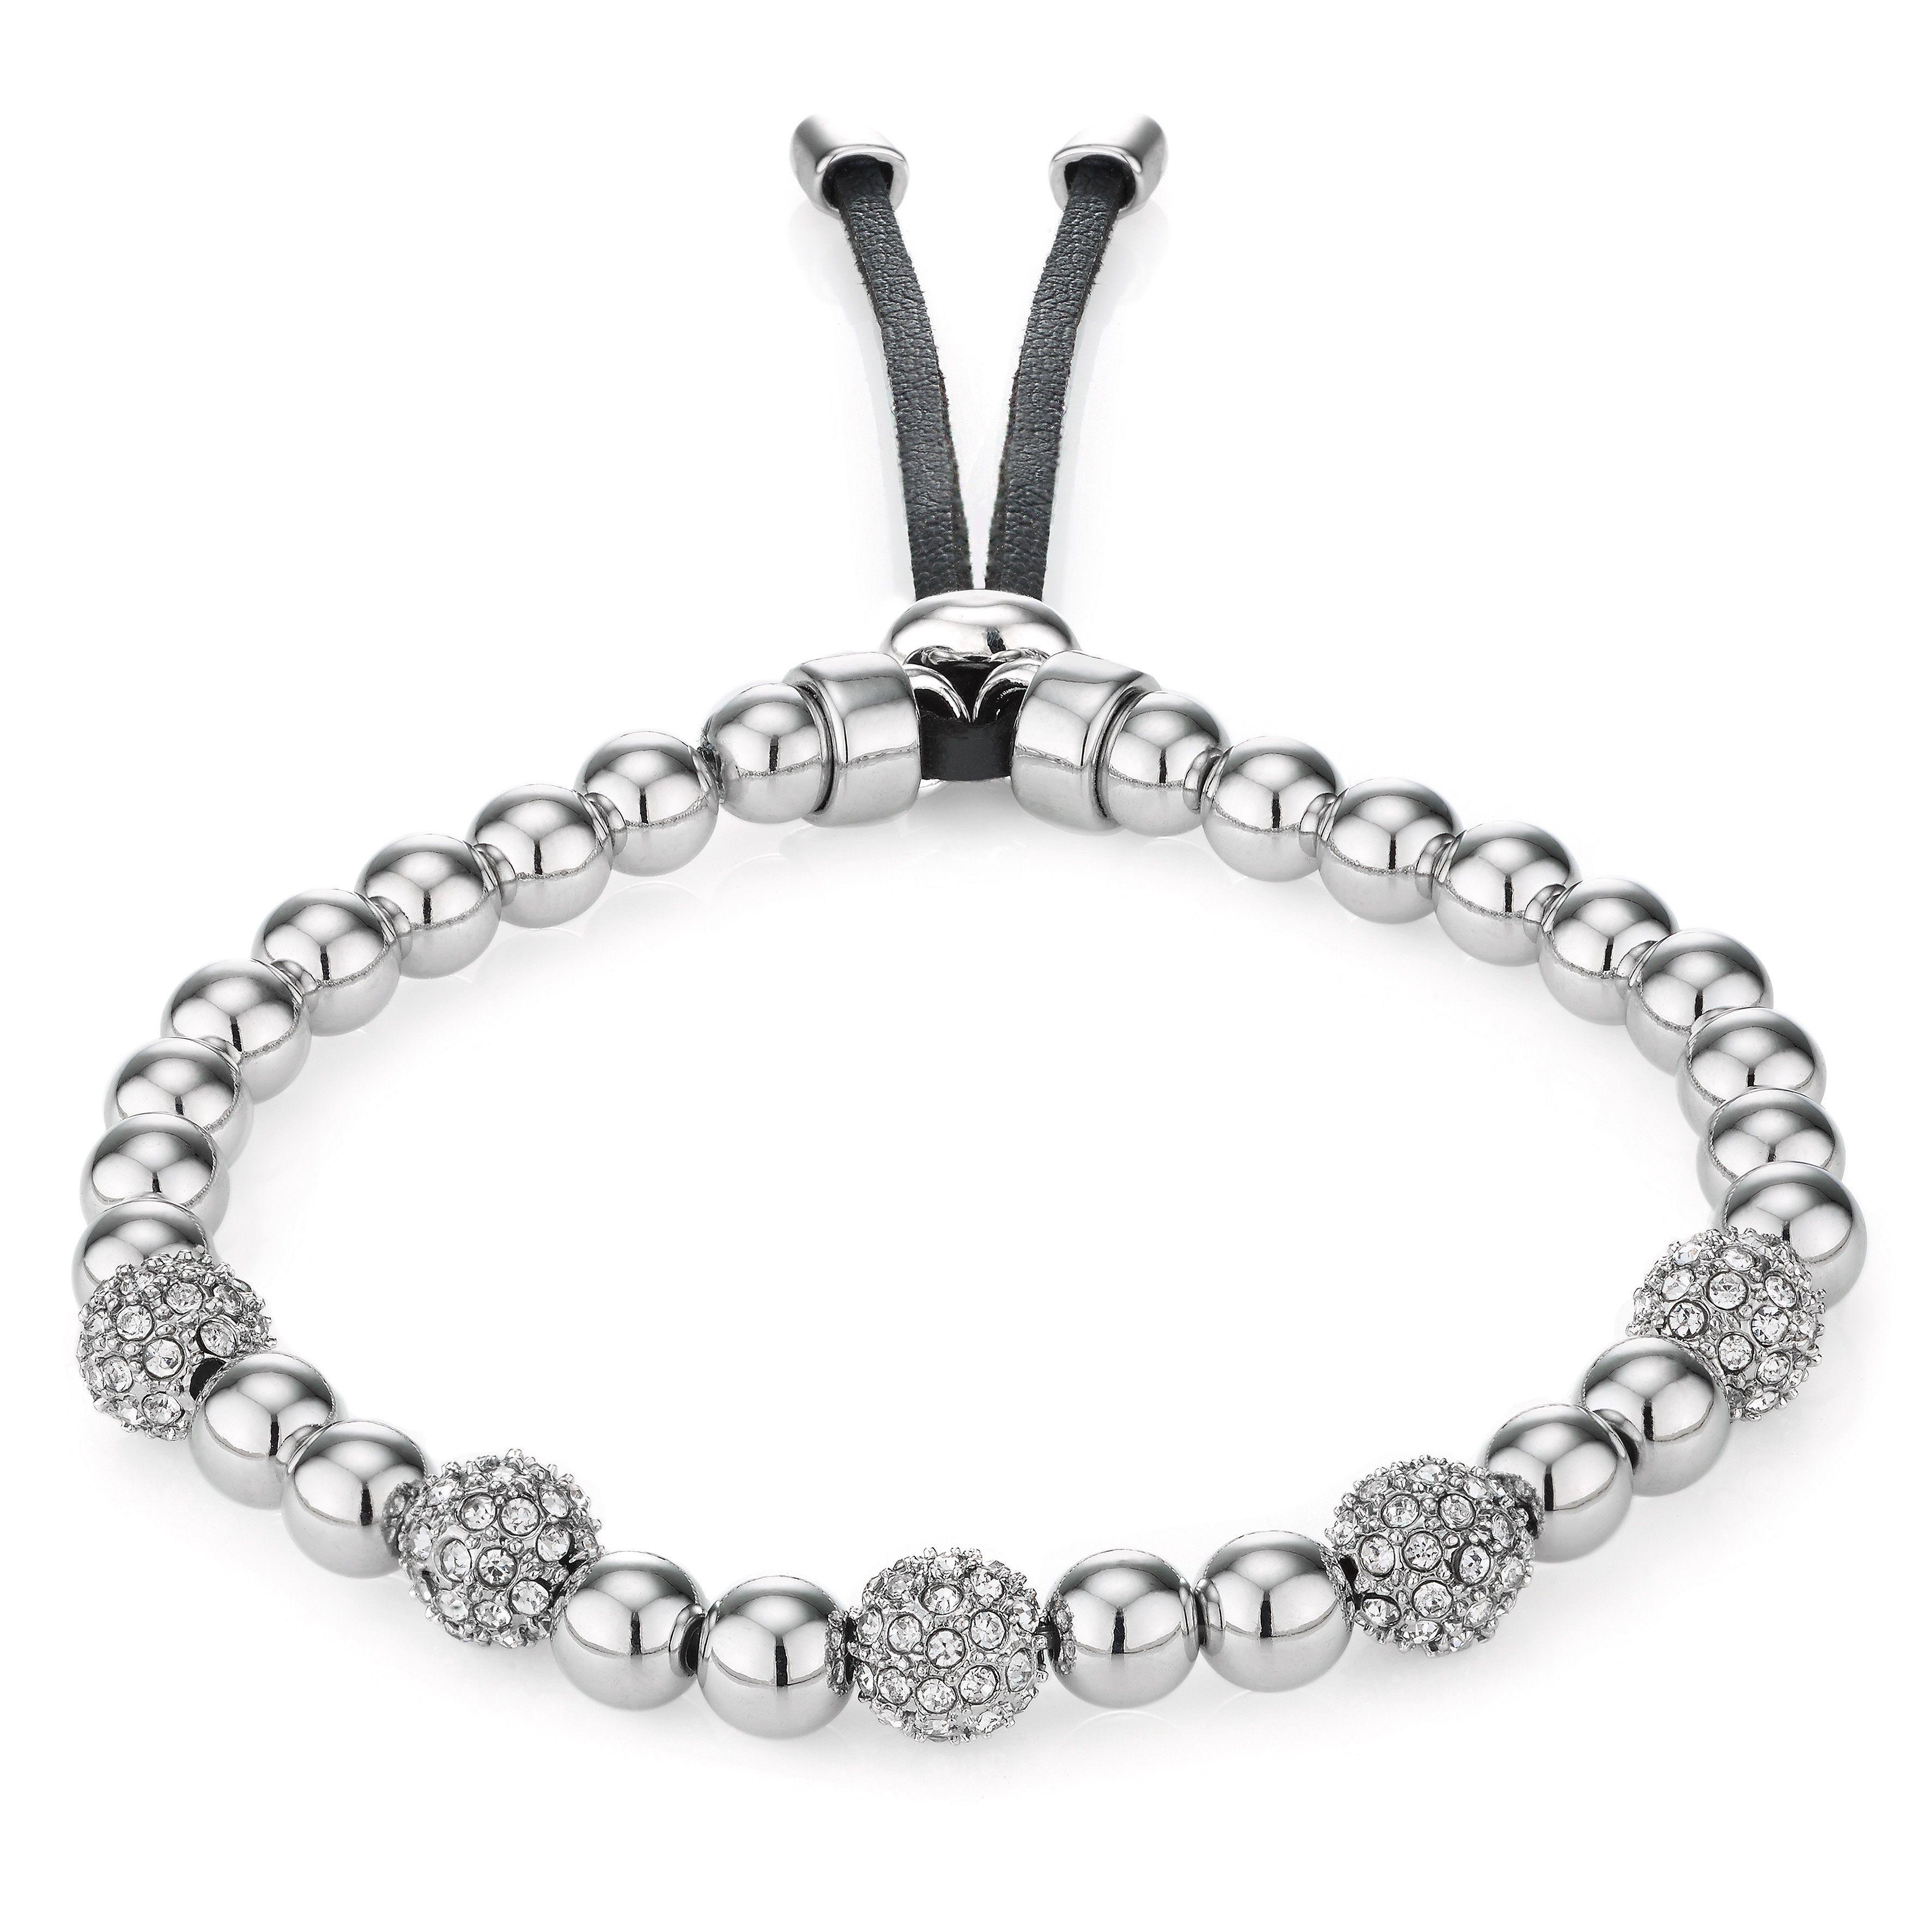 Buckley London Pimlico Bracelet - Silver